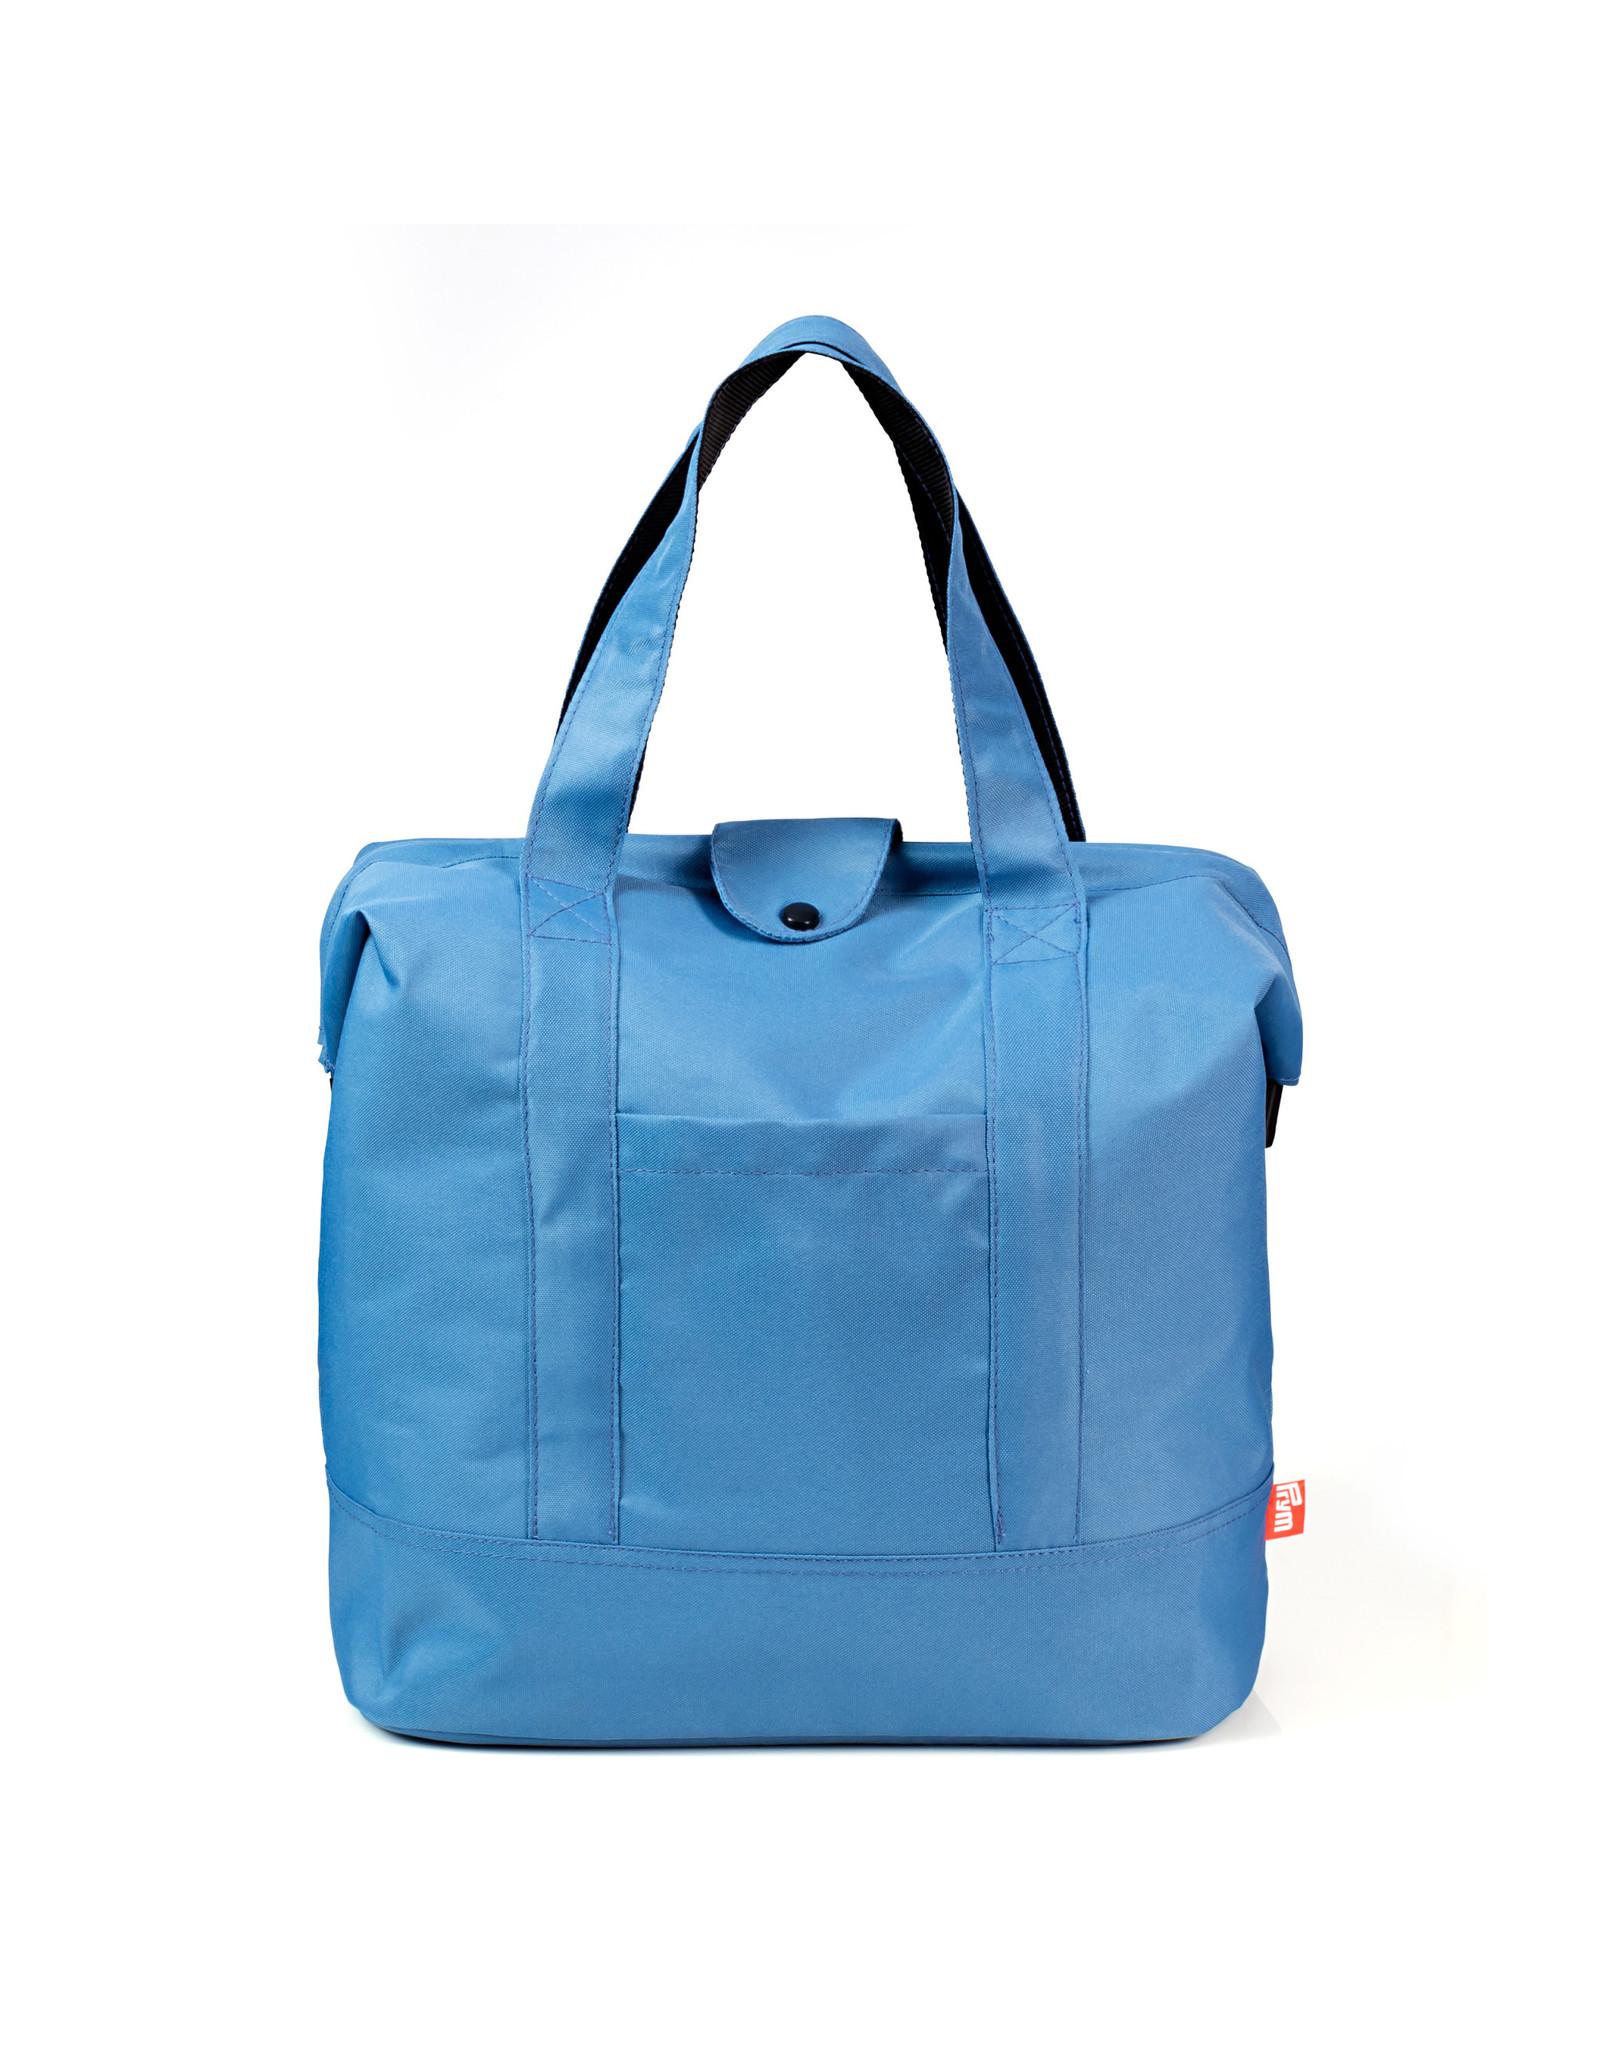 Prym Tas Store & Travel Favorite Friends S blauw - 1 stuks/pce